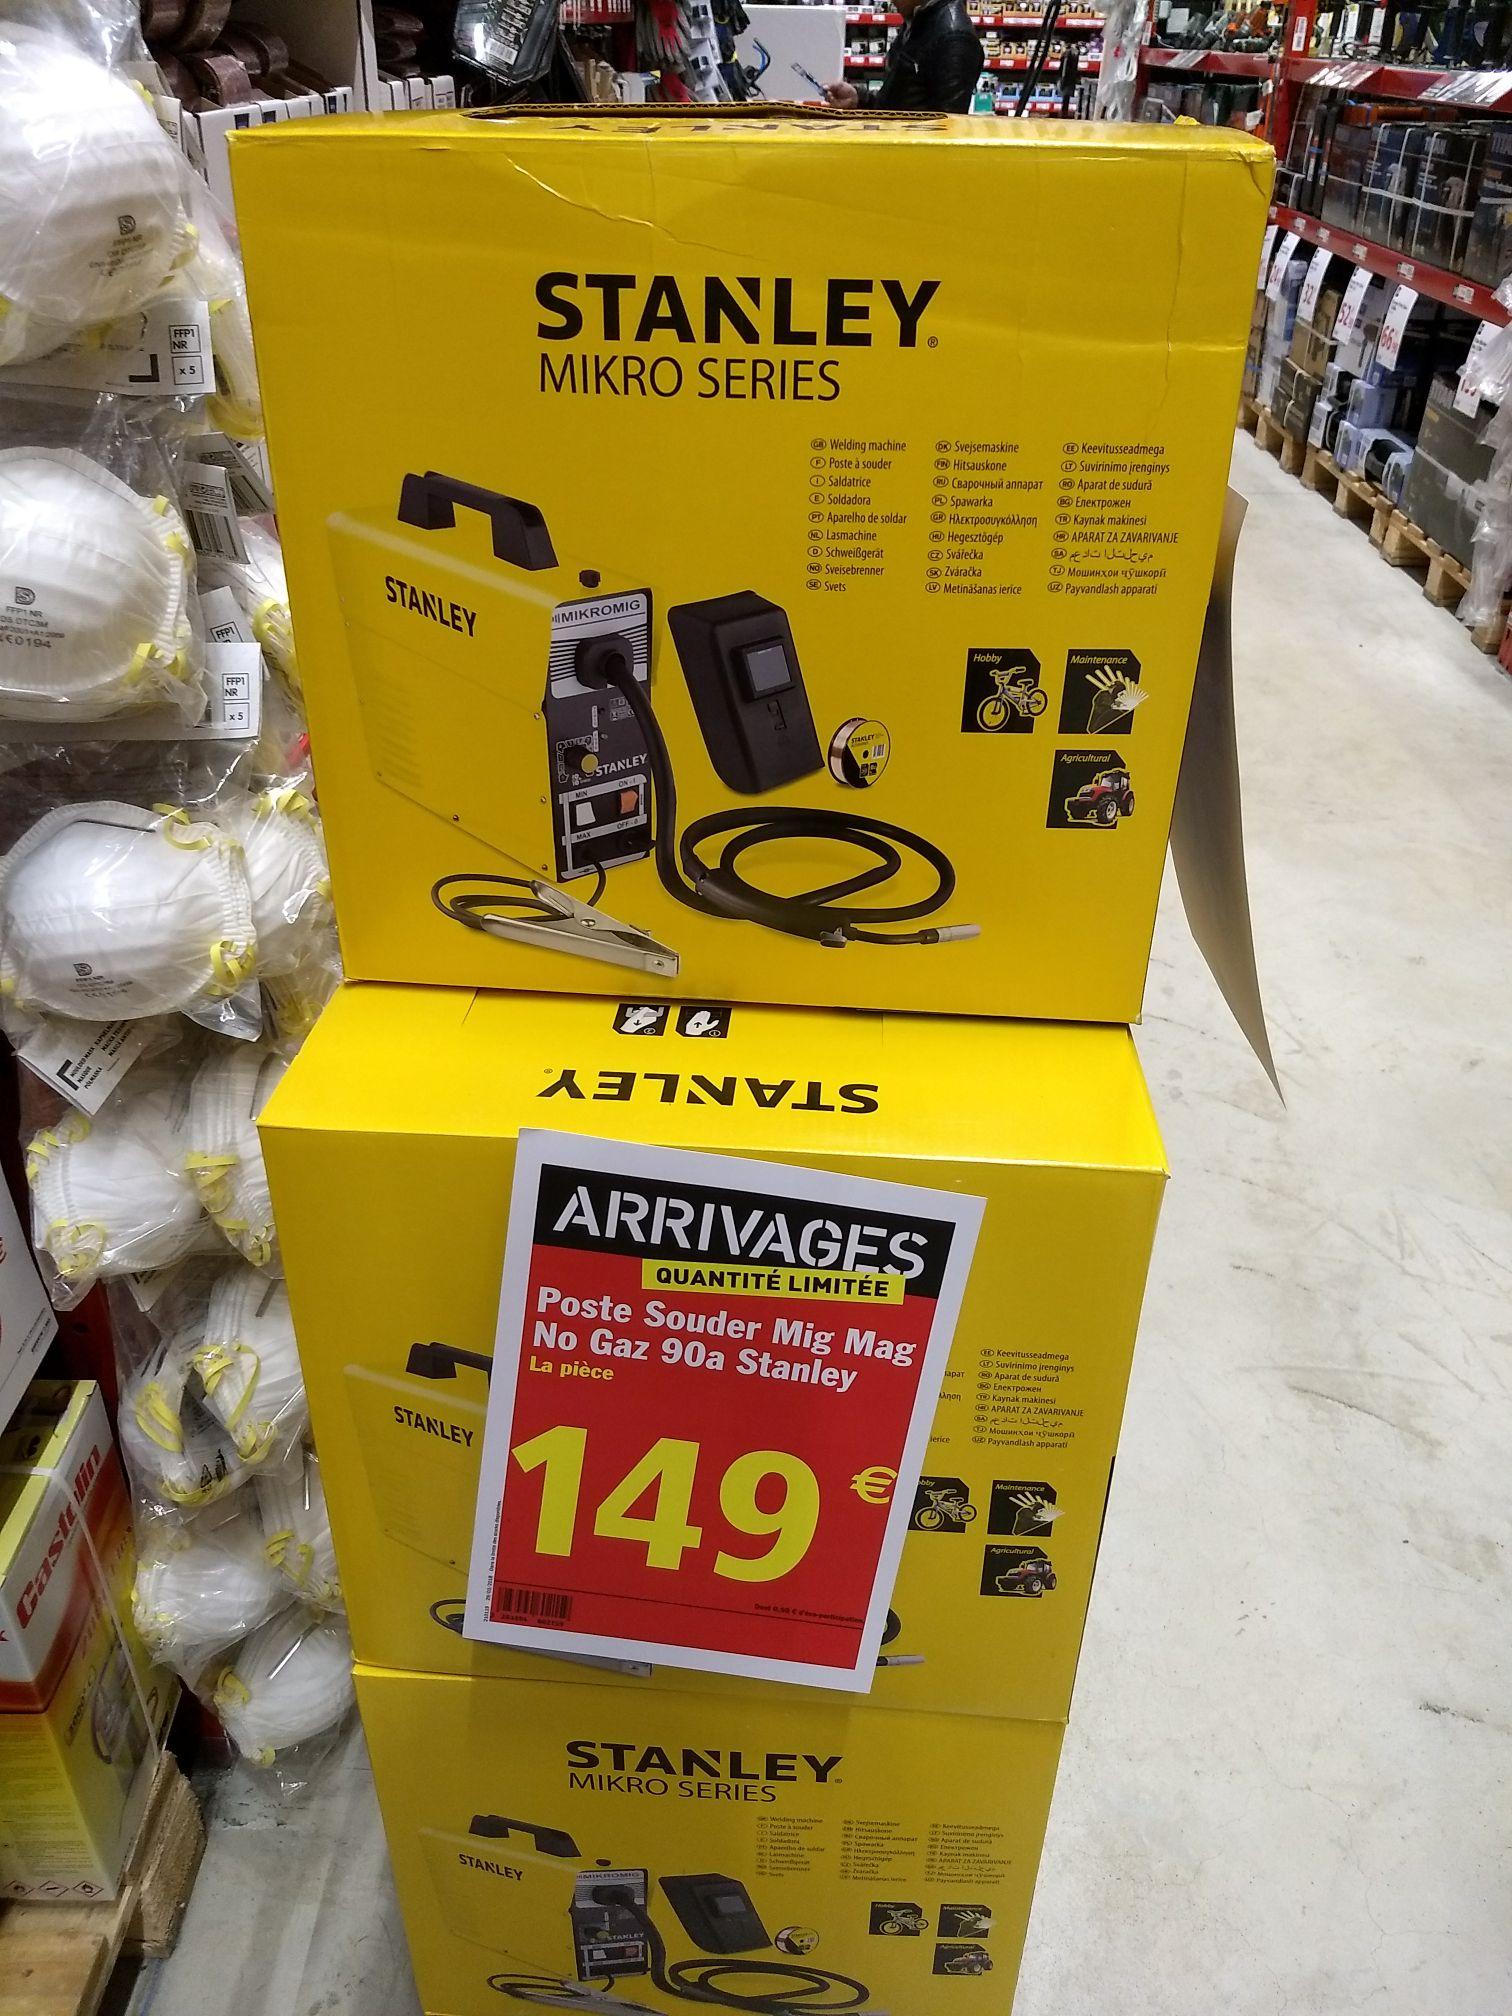 Poste à souder Stanley sans gaz (Longwy 54)